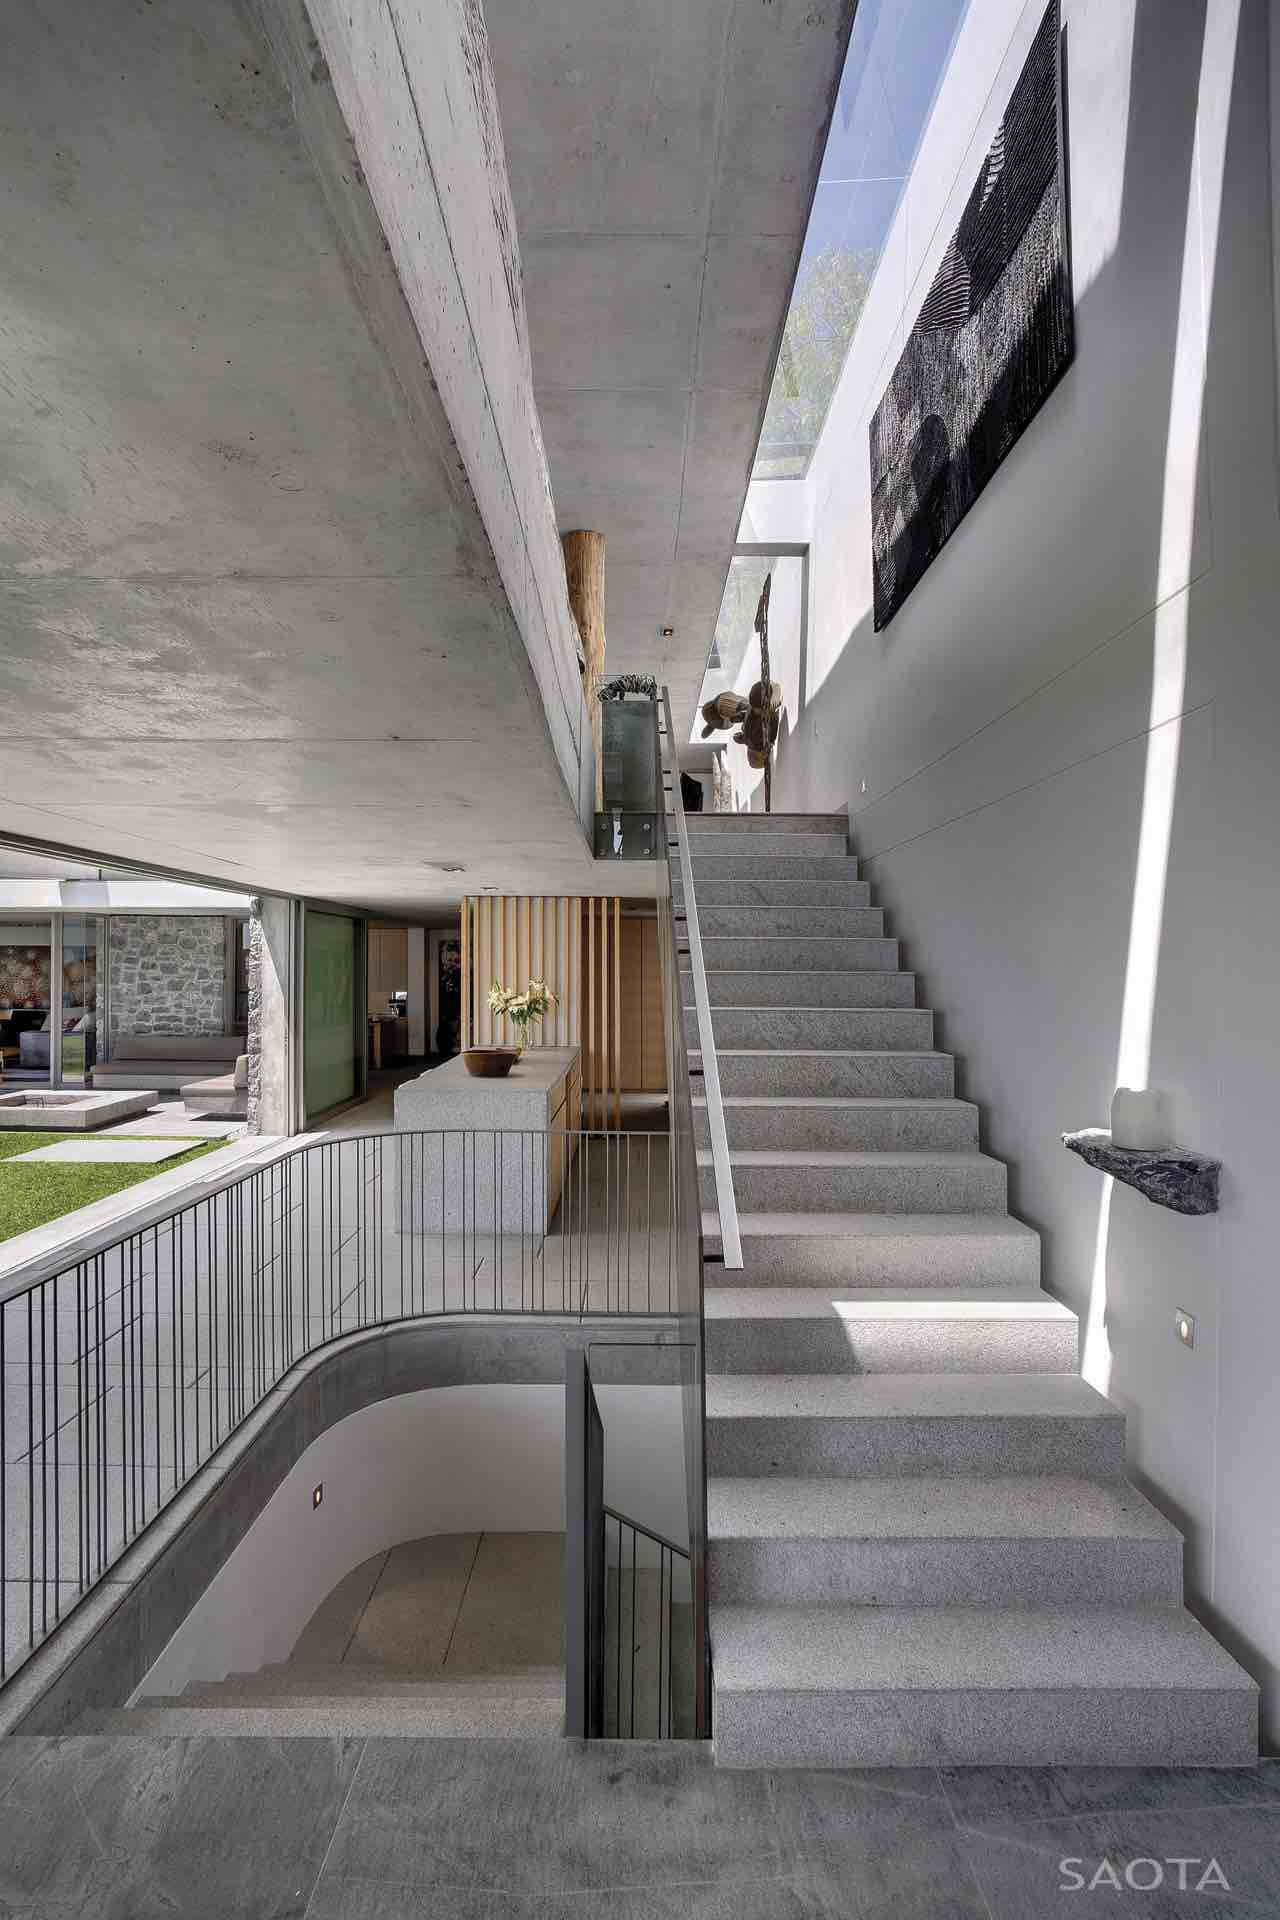 de-wet-34-saota-stefan-antoni-olmesdahl-truen-architects_dewet34_1a_int_106_staircase_001_al